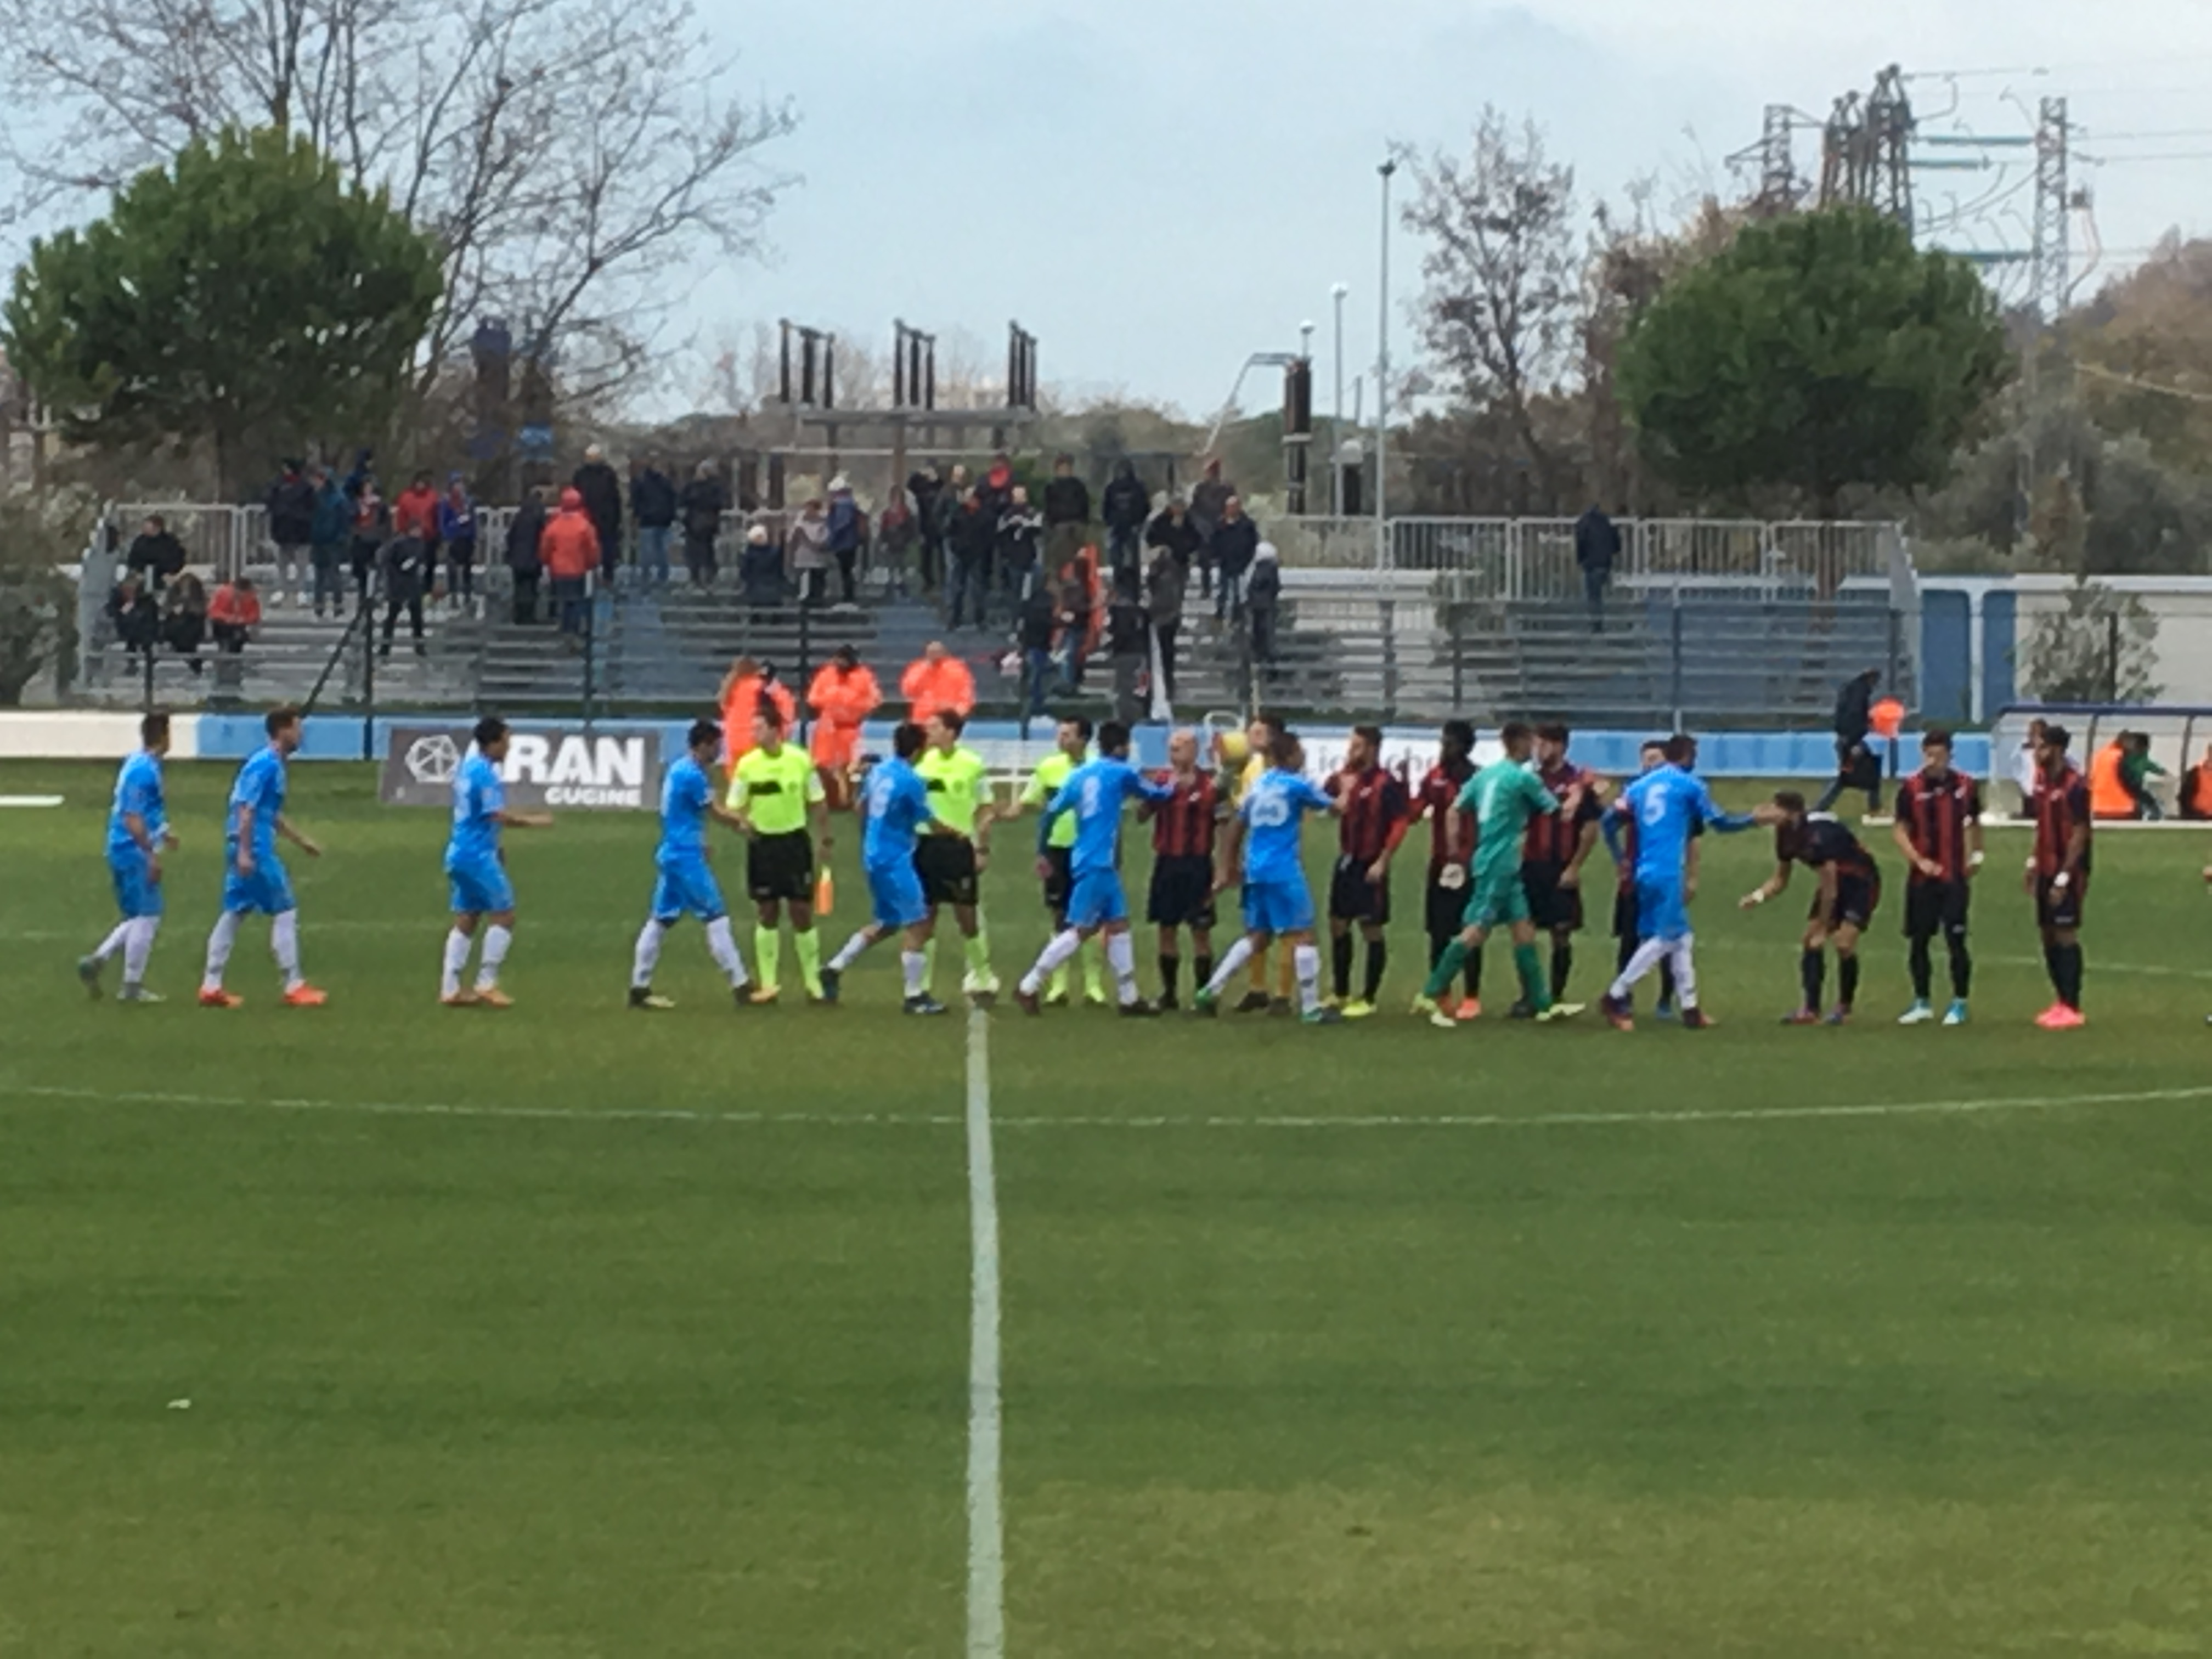 Serie D Pineto L'Aquila -Finale 1-1